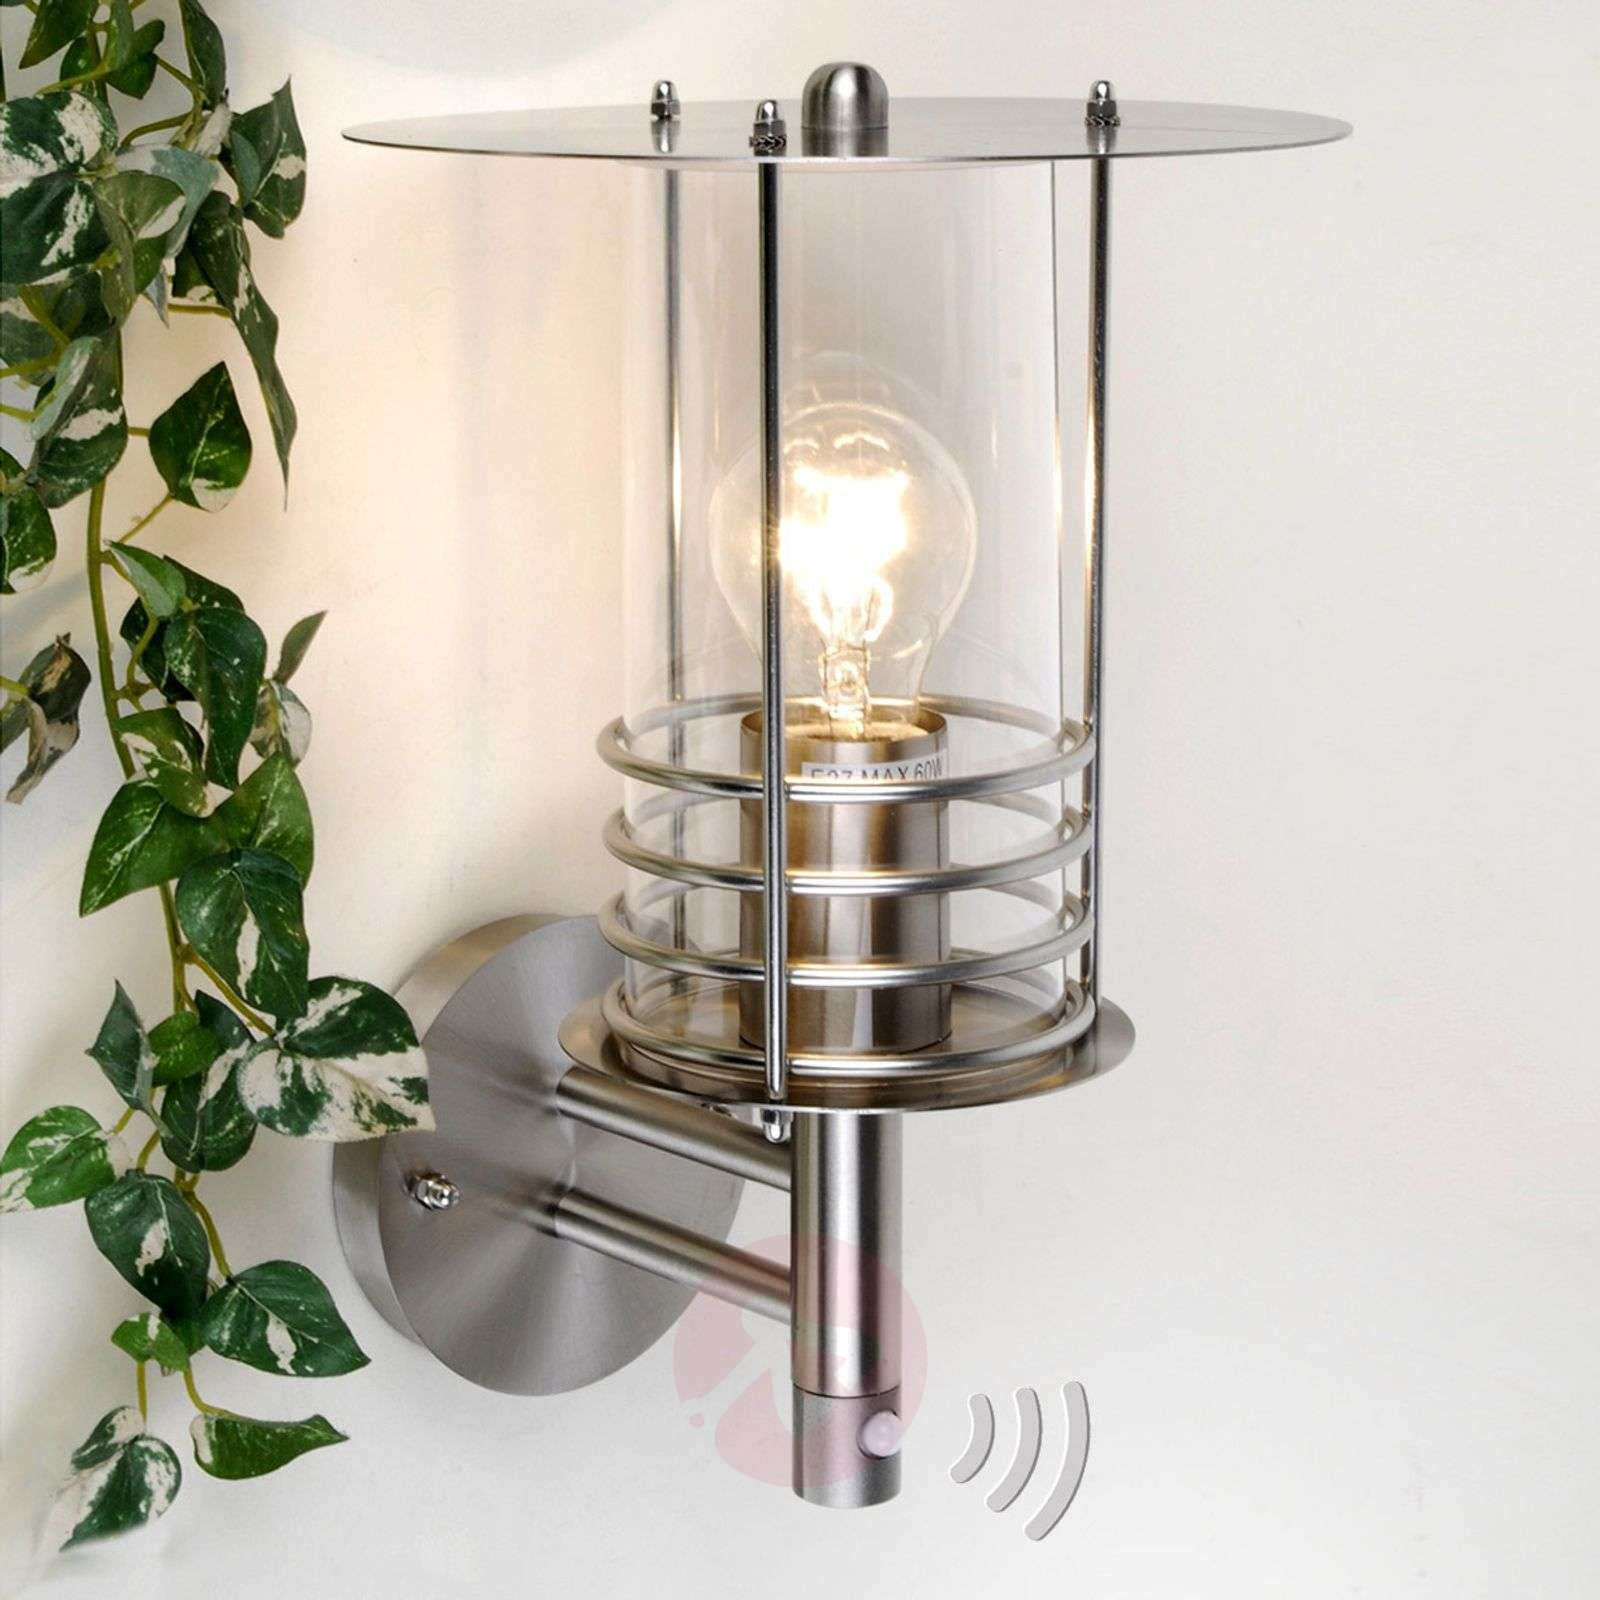 Motion sensor outdoor wall light Miko-9972071-01